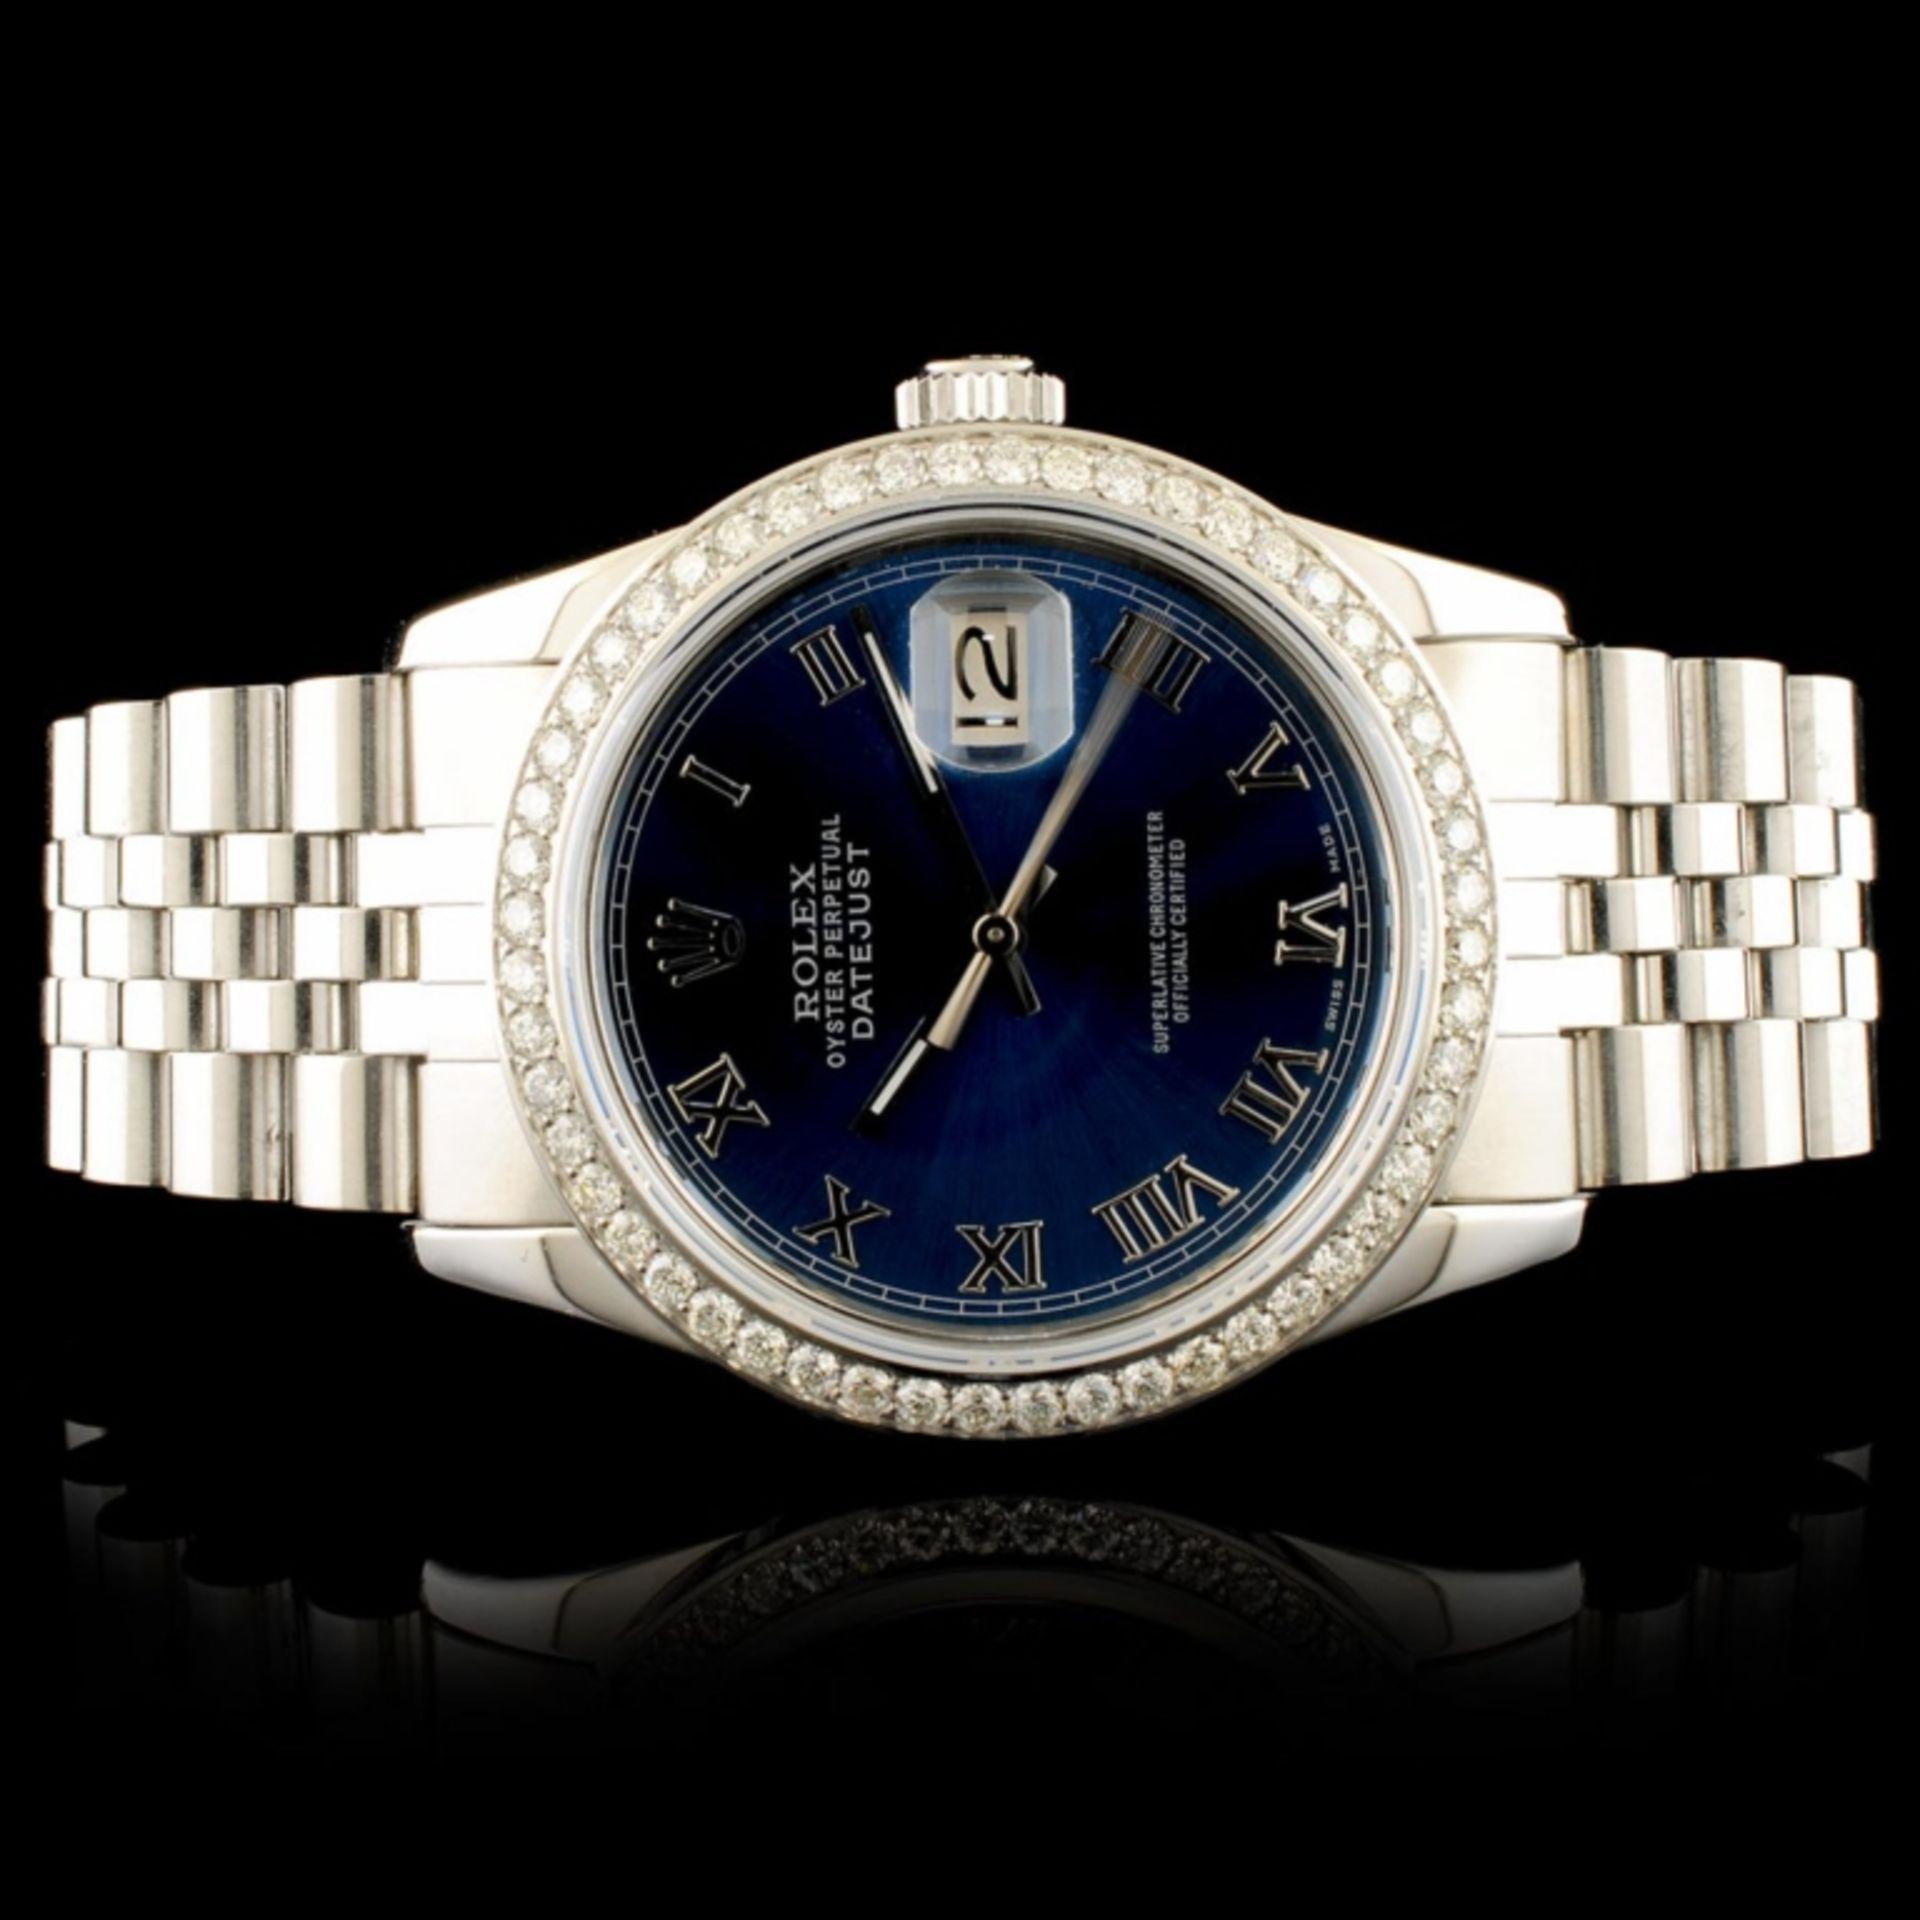 Rolex DateJust 1.35ct Diamond 36MM Wristwatch - Image 2 of 4